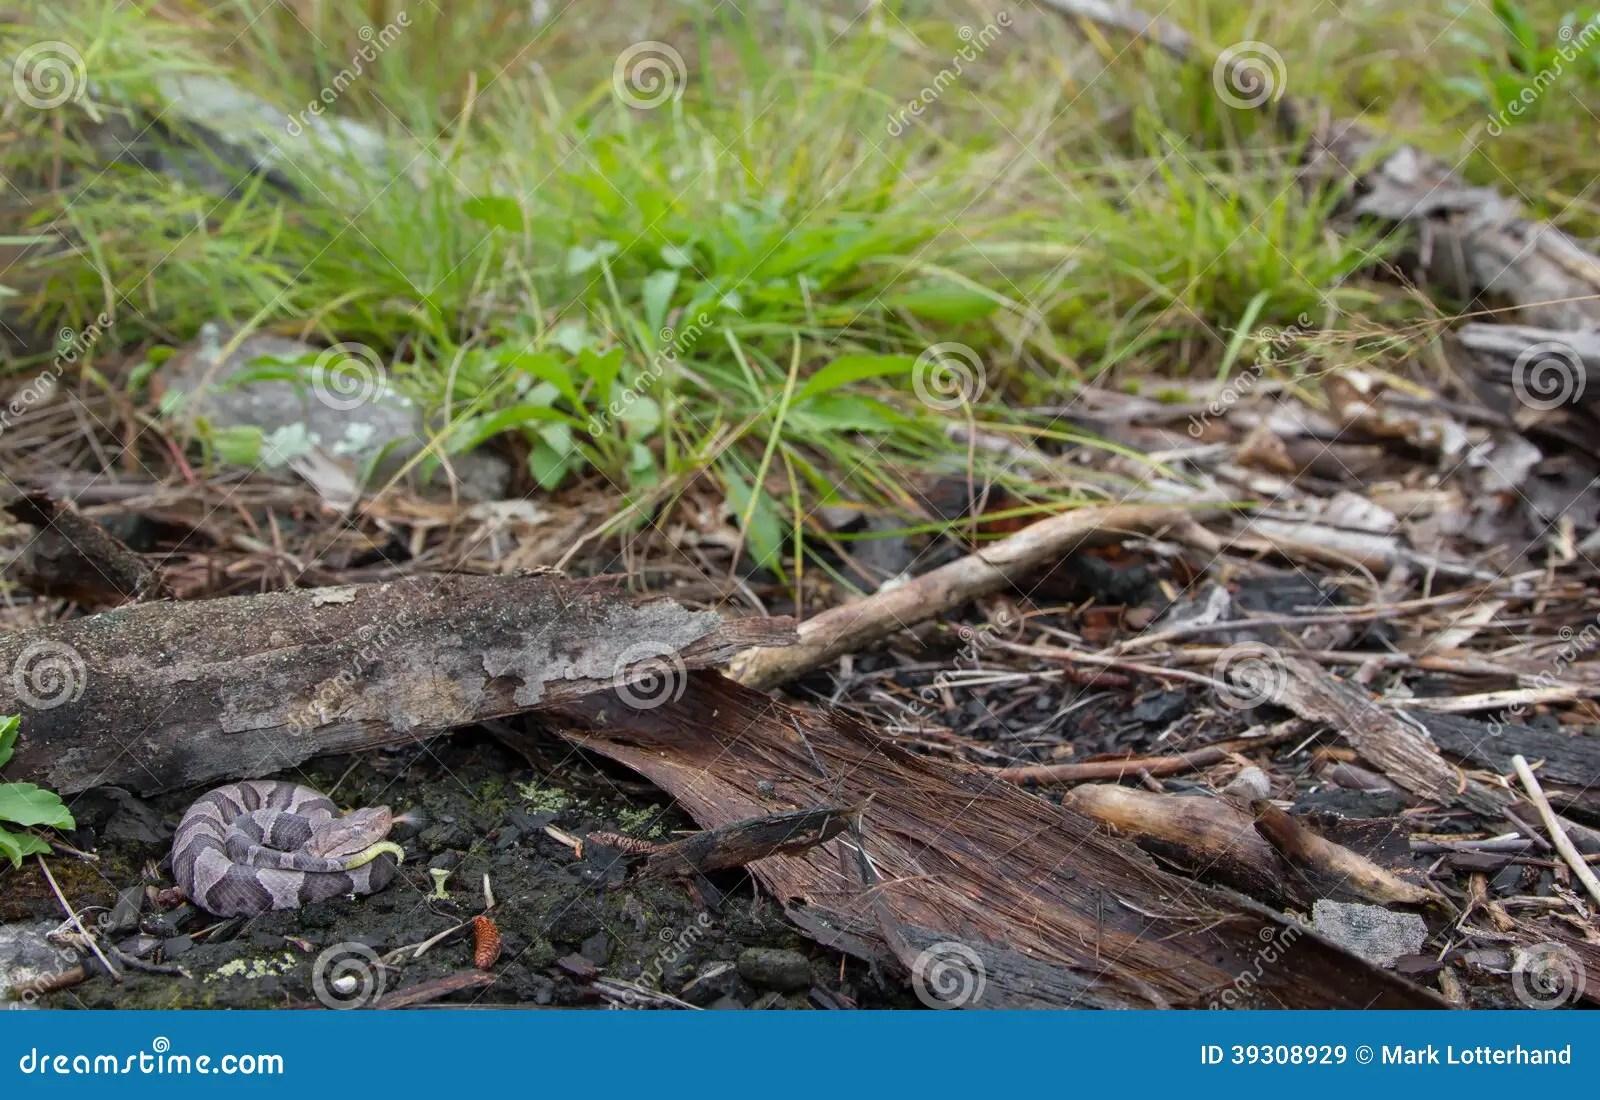 Newborn Northern Copperhand Stock Photo - Image: 39308929